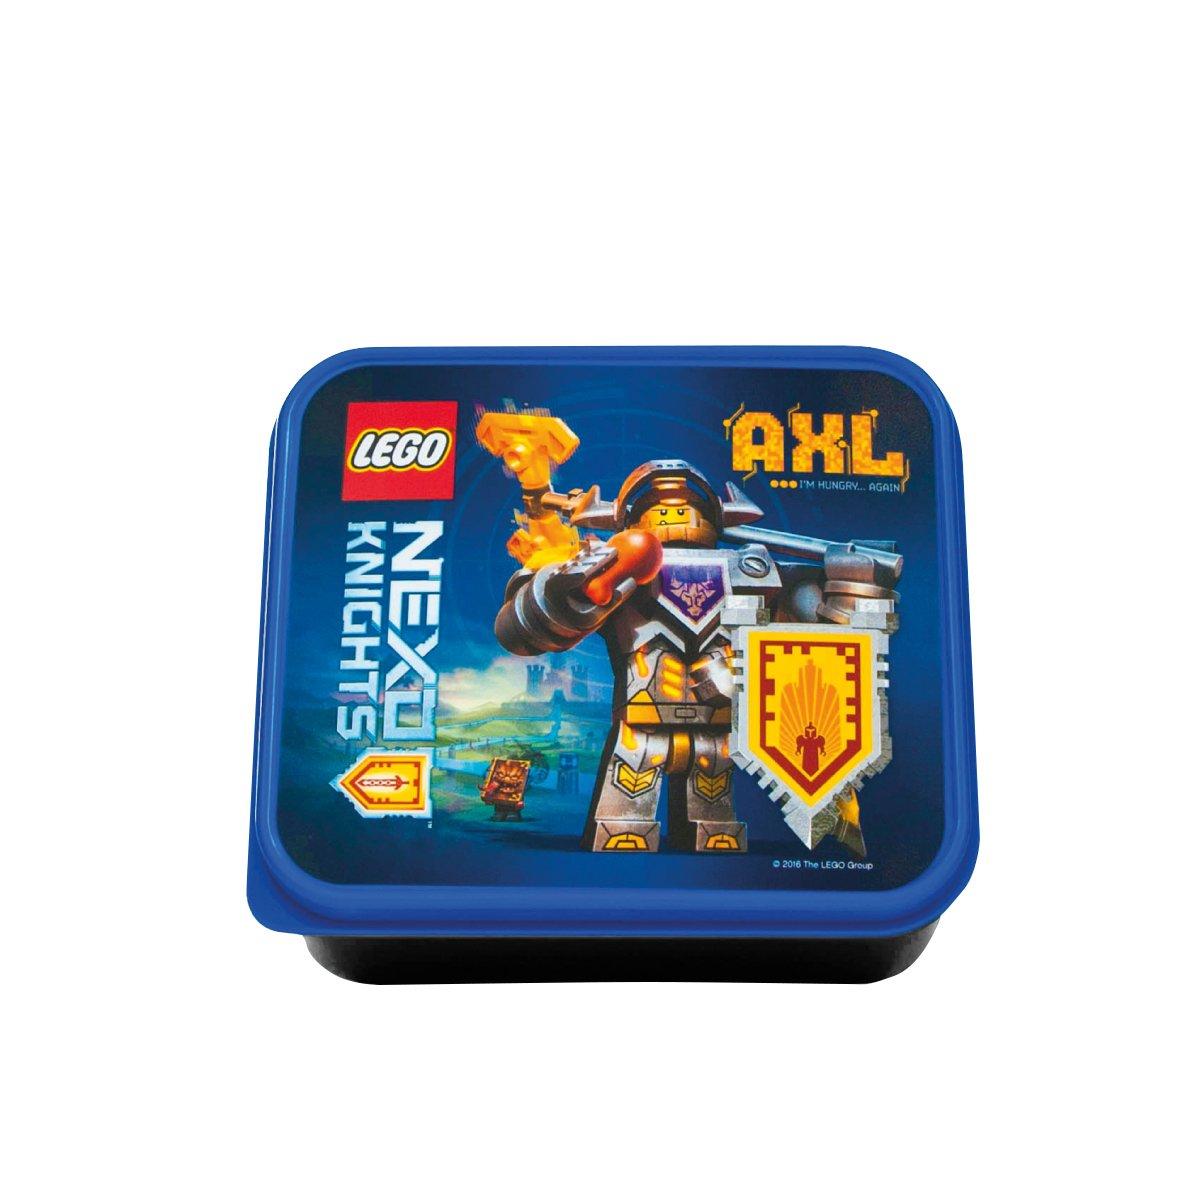 Amazon.com: LEGO Lunch Set Nexo Knights, Bright Blue: Home ...